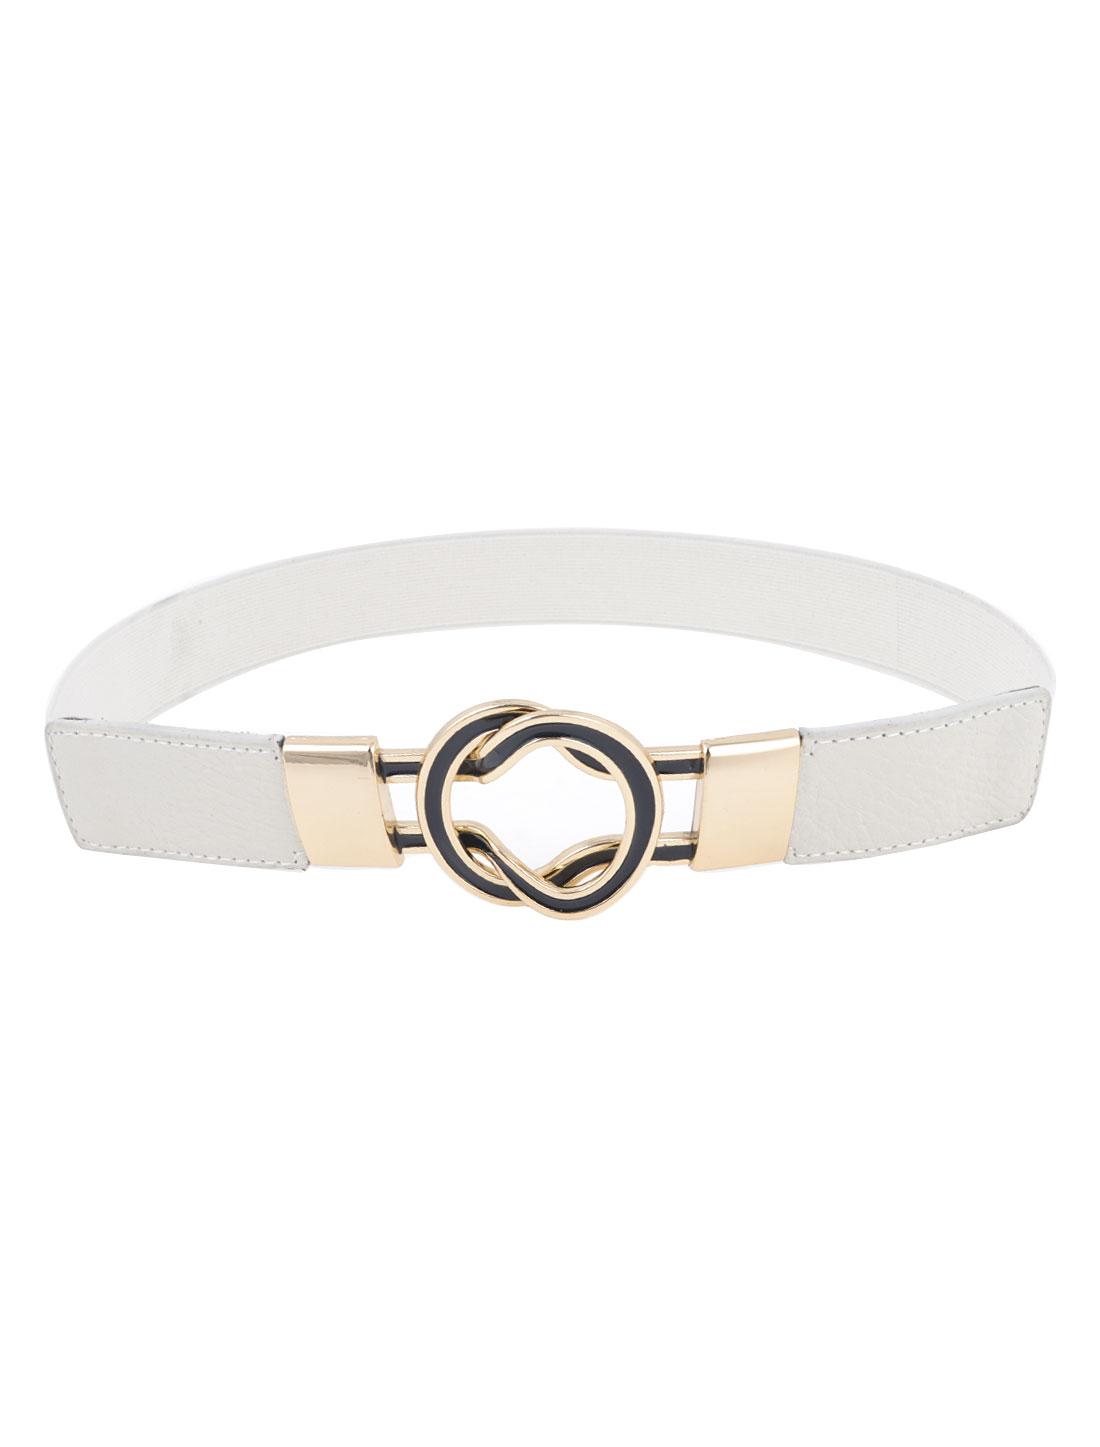 Women Round Shaped Interlocking Buckle Elastic Skirt Cinch Waist Belt White